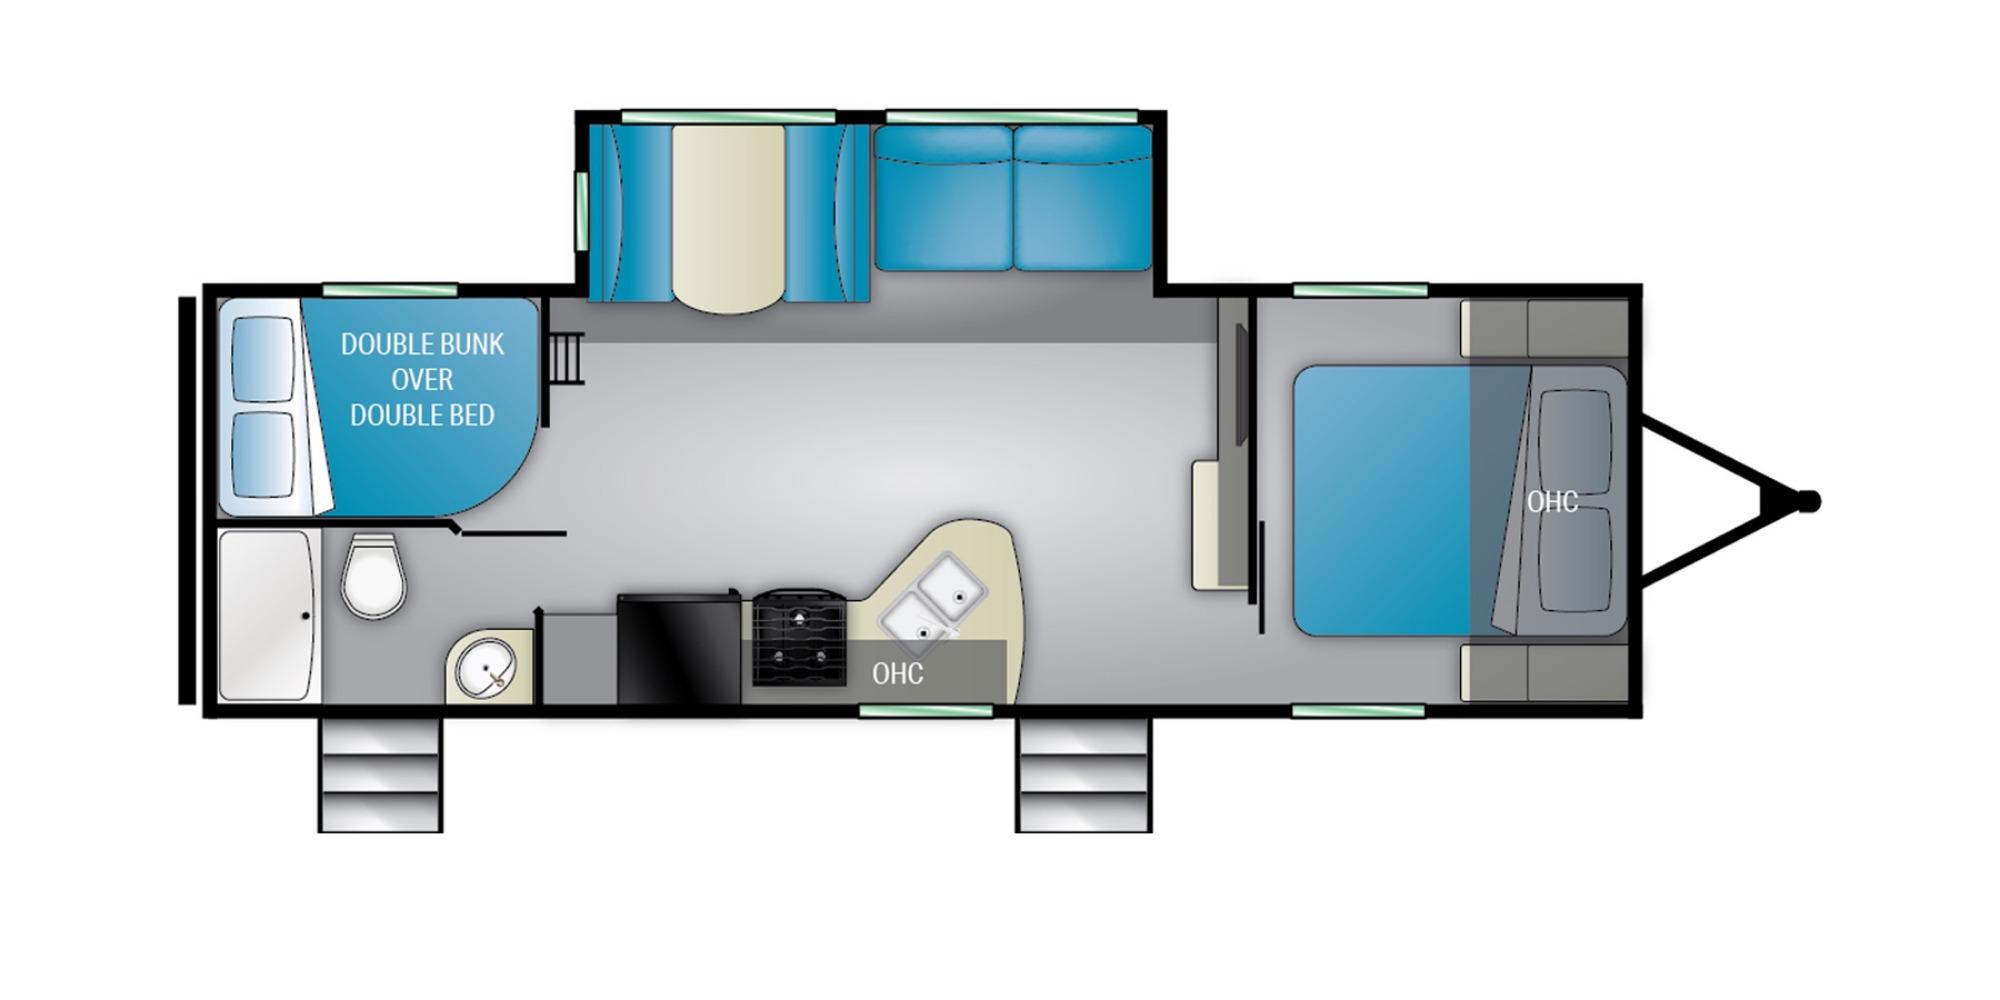 View Floor Plan for 2022 HEARTLAND PIONEER BH270